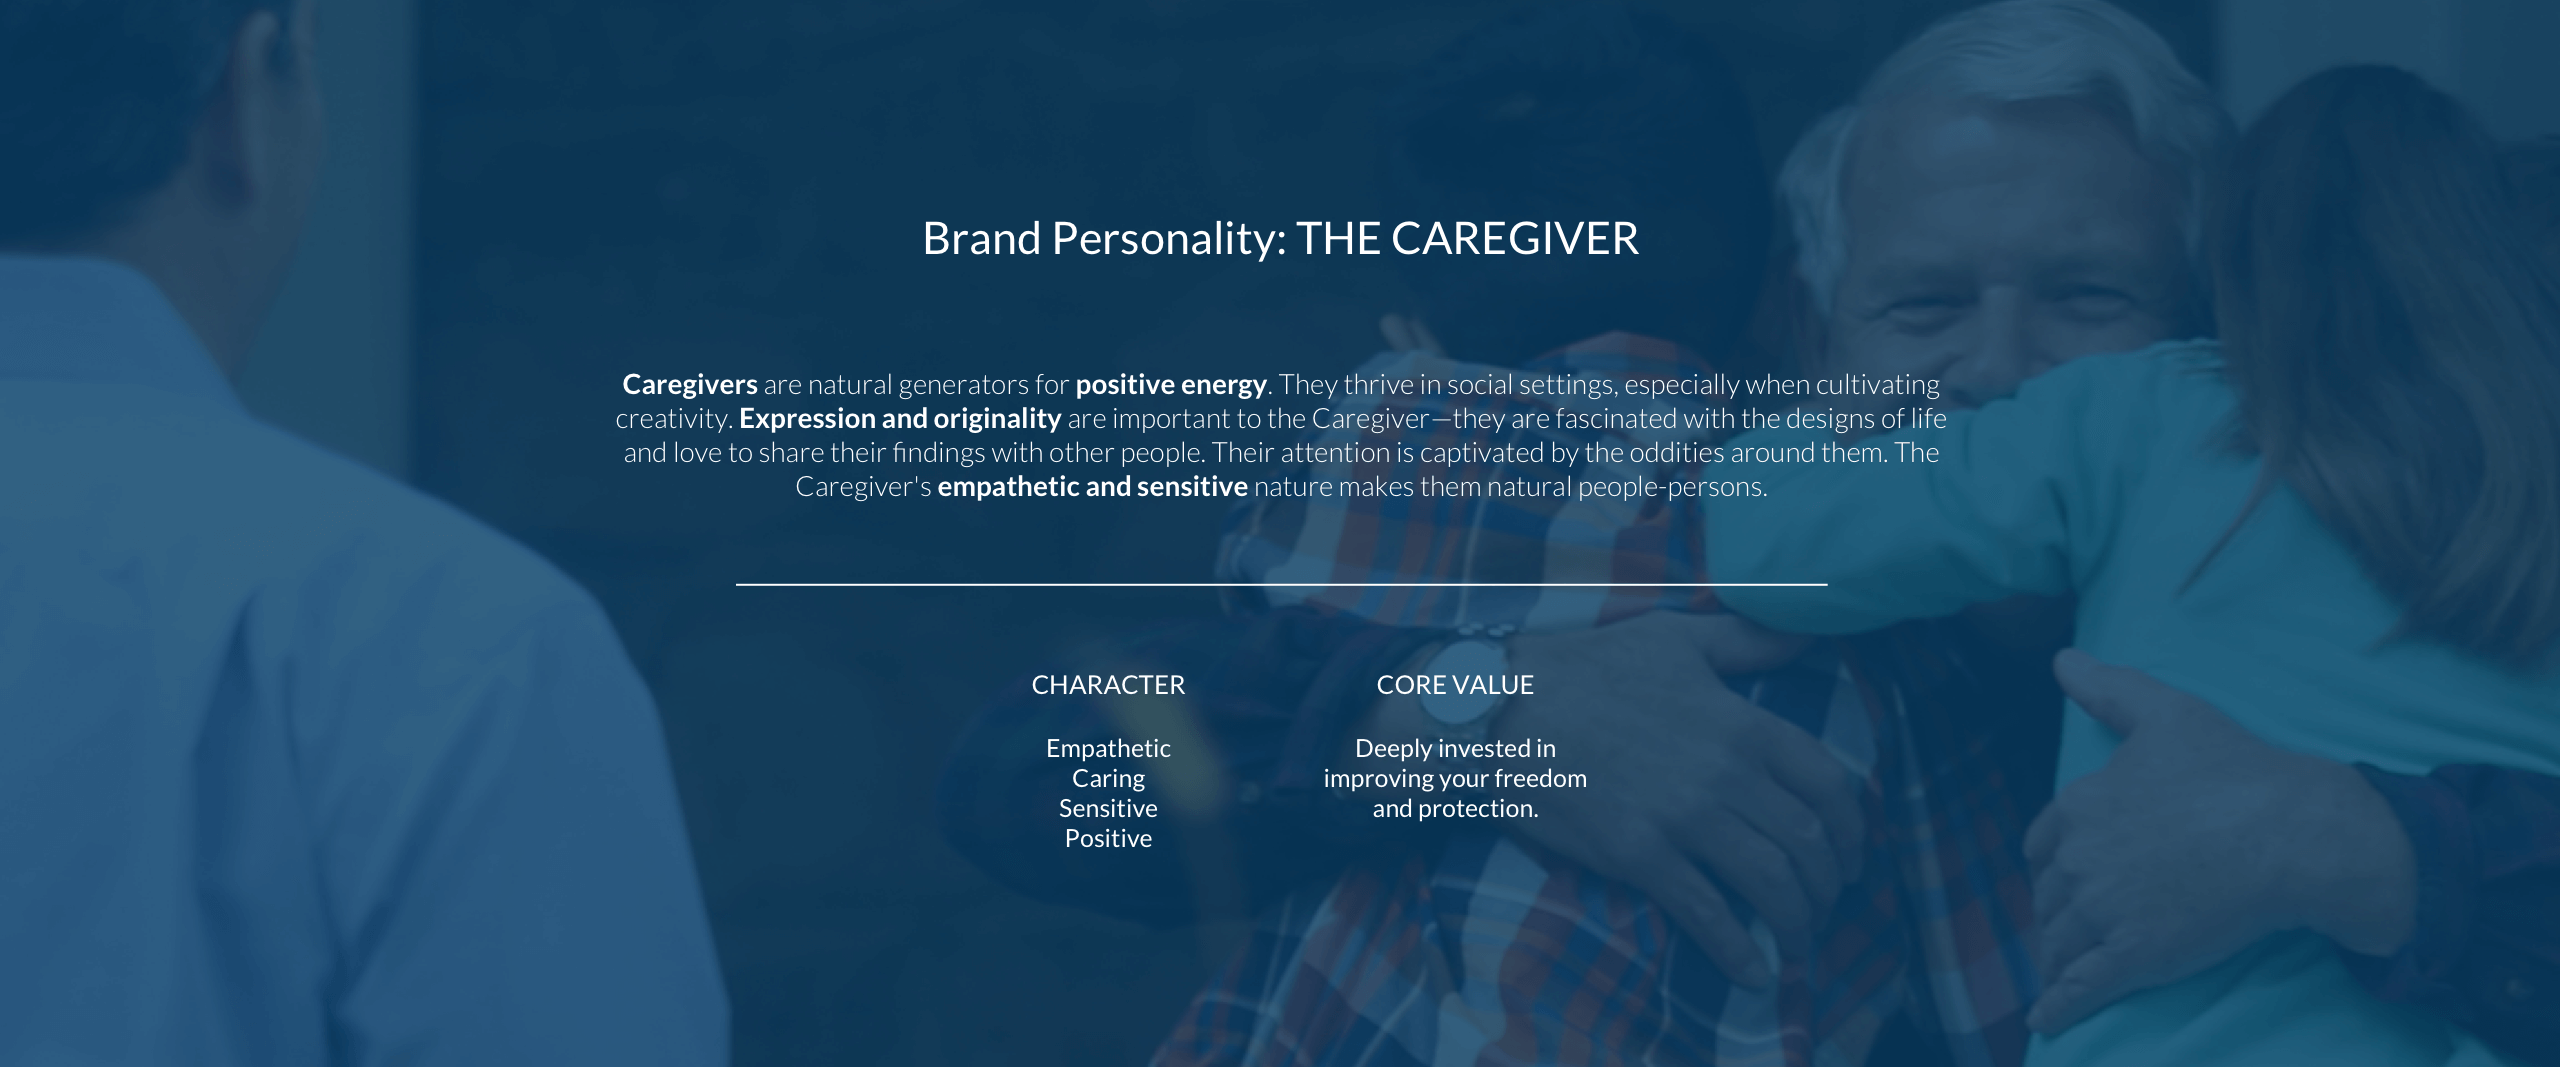 brand_personality_alert365